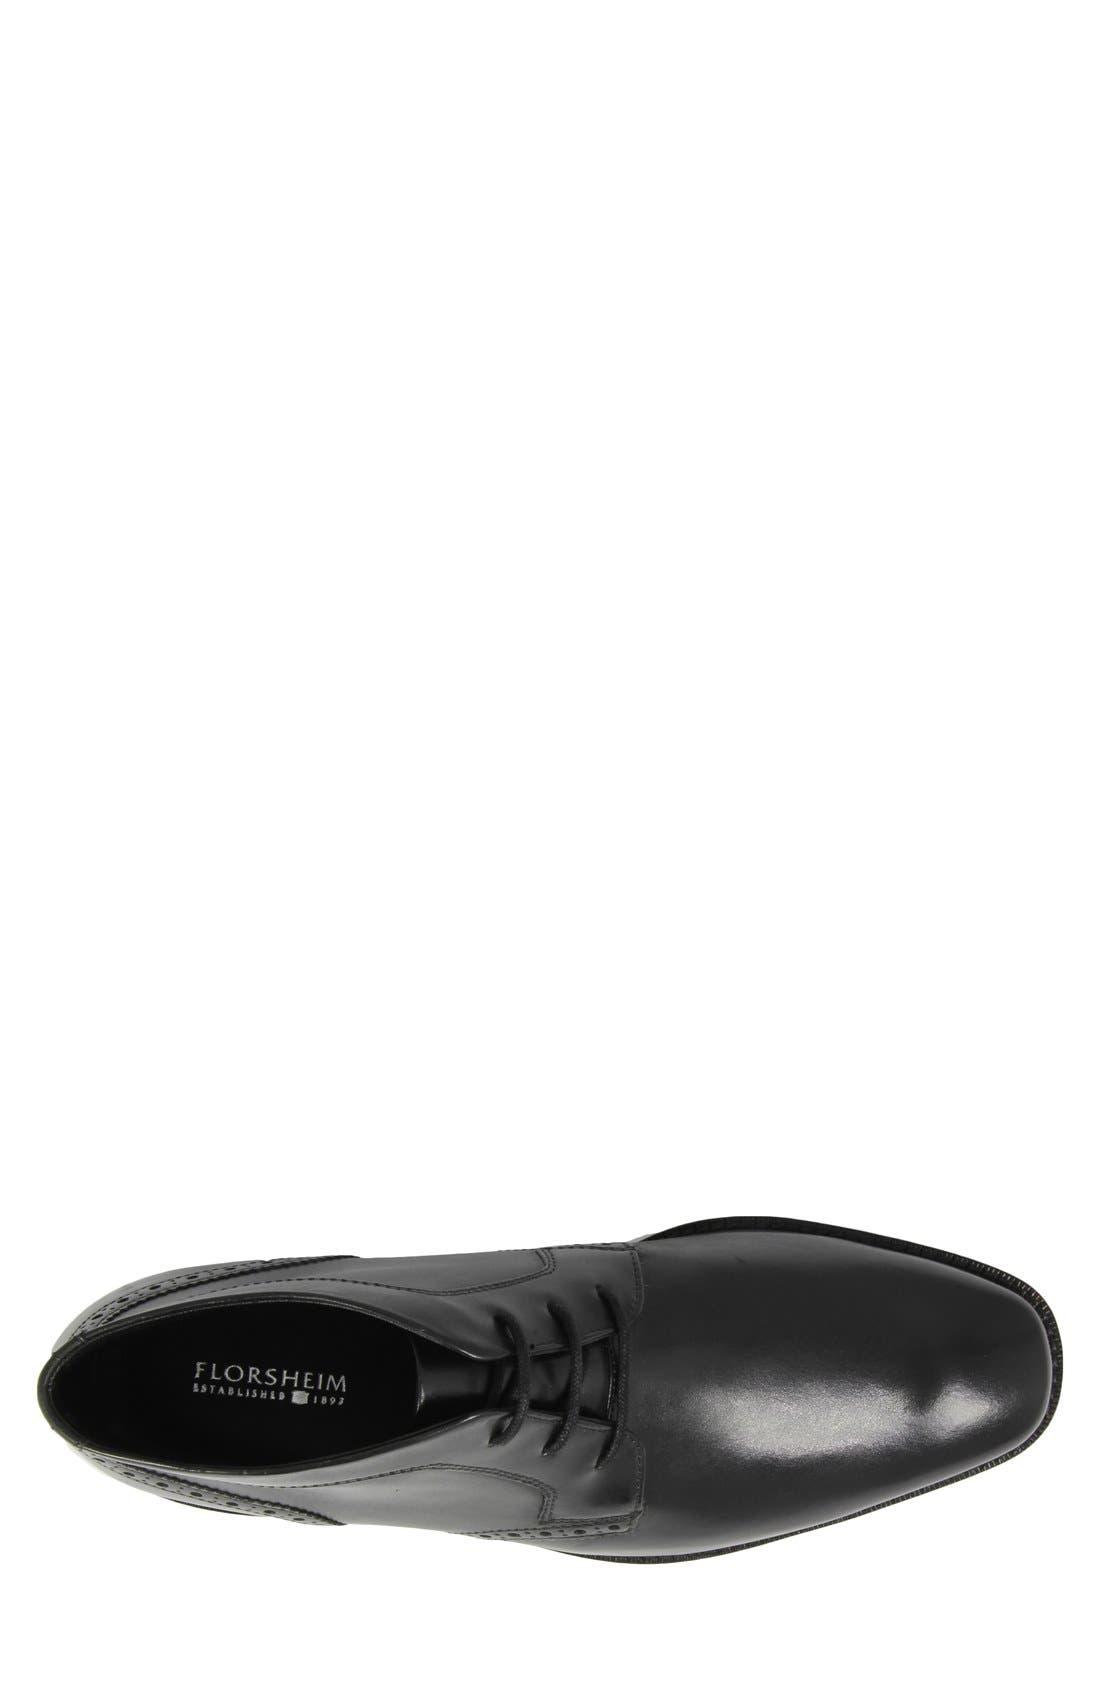 'Castellano' Chukka Boot,                             Alternate thumbnail 3, color,                             001